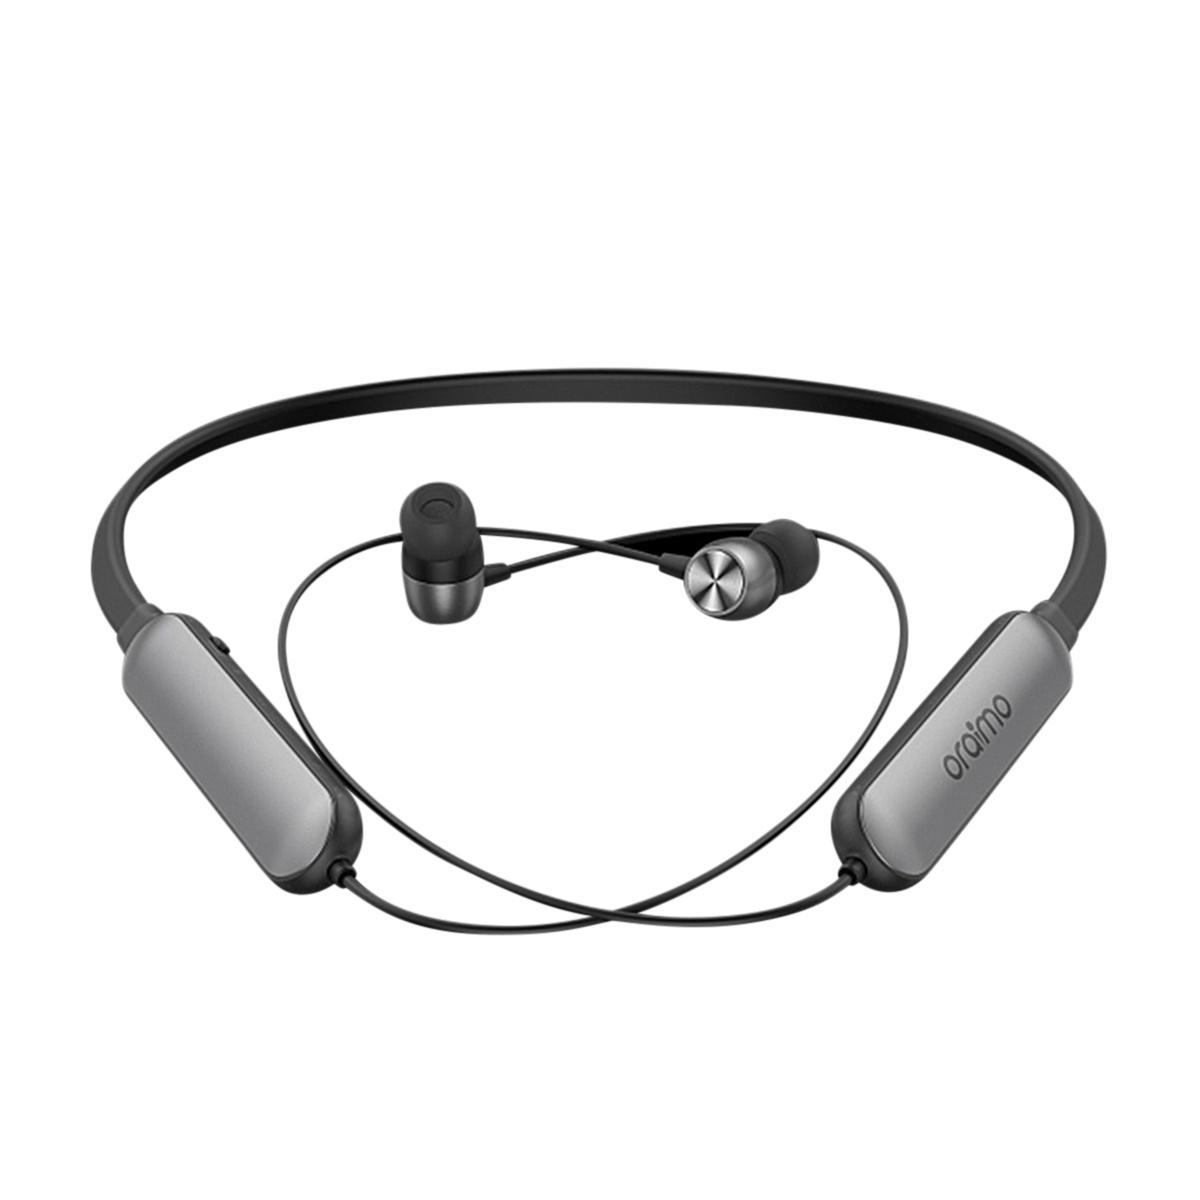 31d357ea747 Oraimo Necklace OEB-E54D Wireless Bluetooth In-Ear Headphones - Black